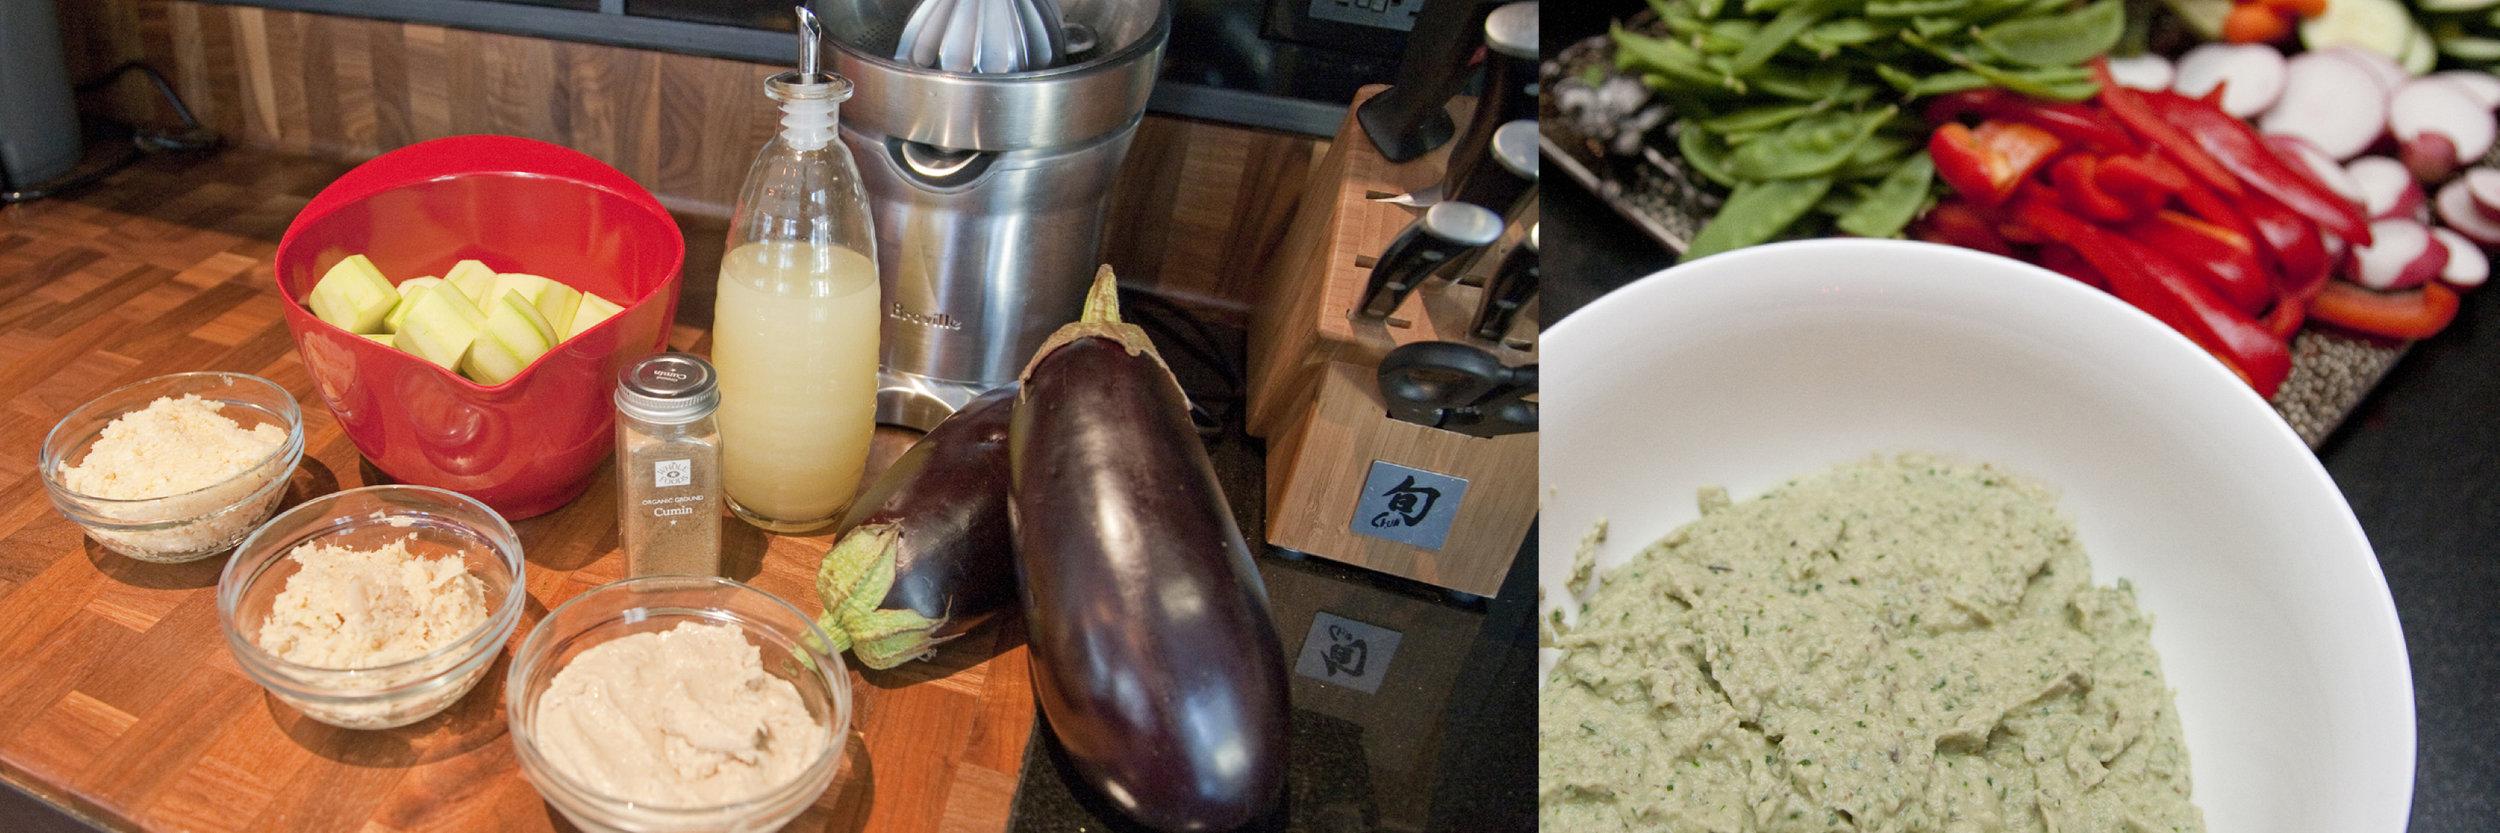 eggplant1.jpg